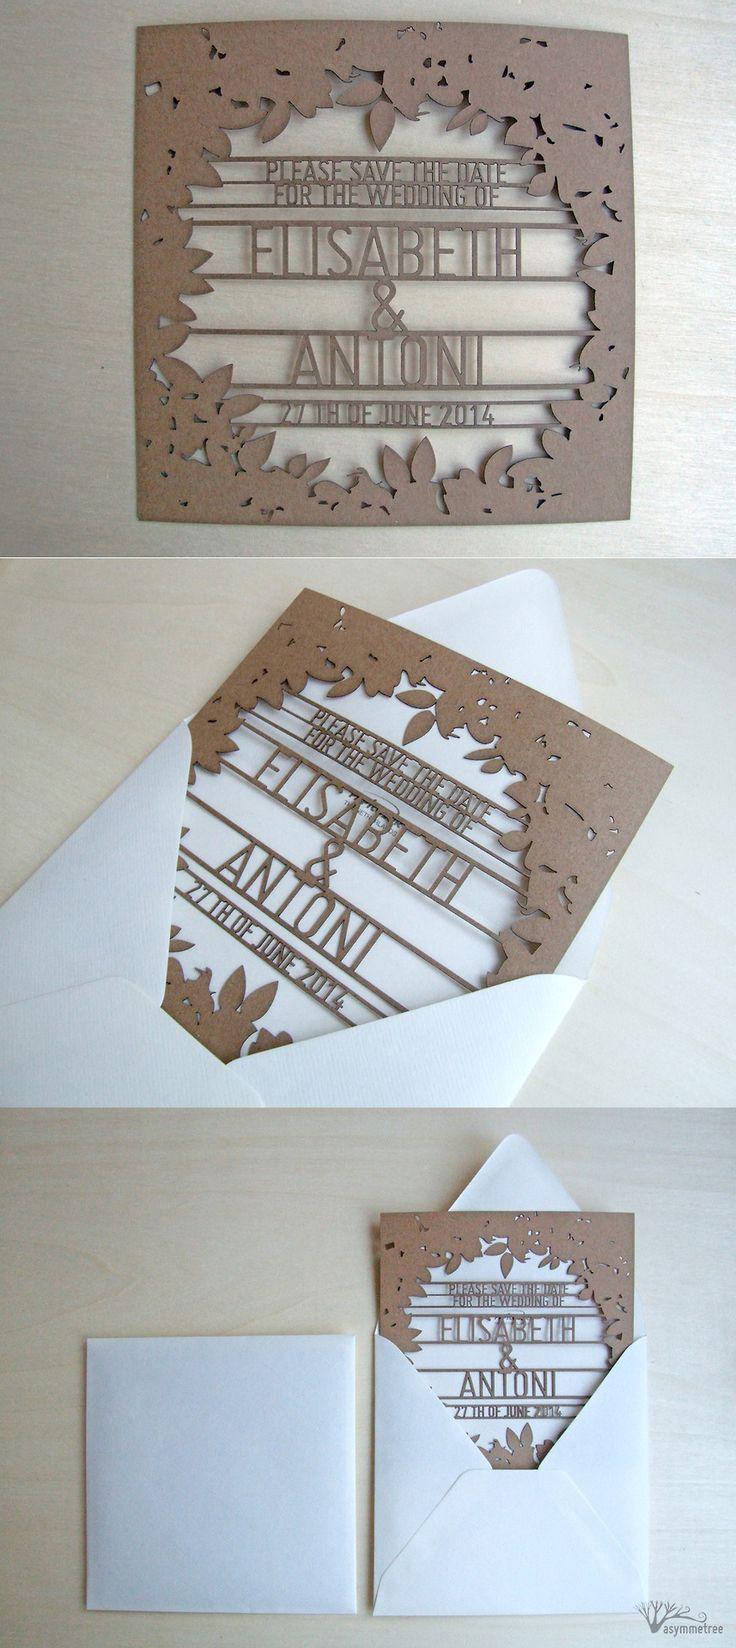 Rustic wedding invitations by Asymmetree #laser cut #recycled